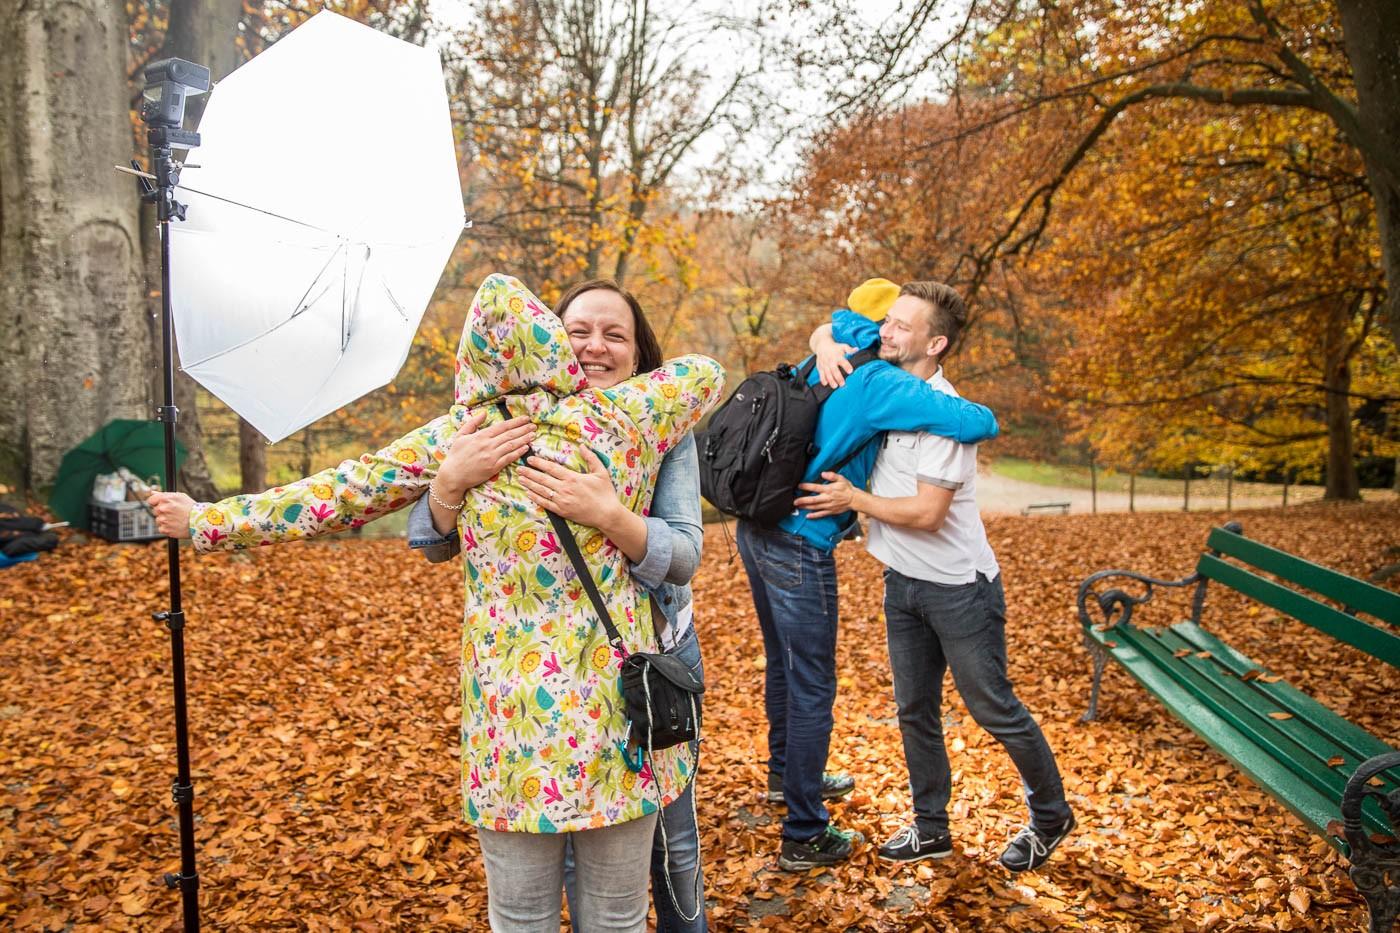 heiratsantrag-paarfotos-paarshooting-überraschung-freude-herbststimmung-fotografin-innsbruck-tirol